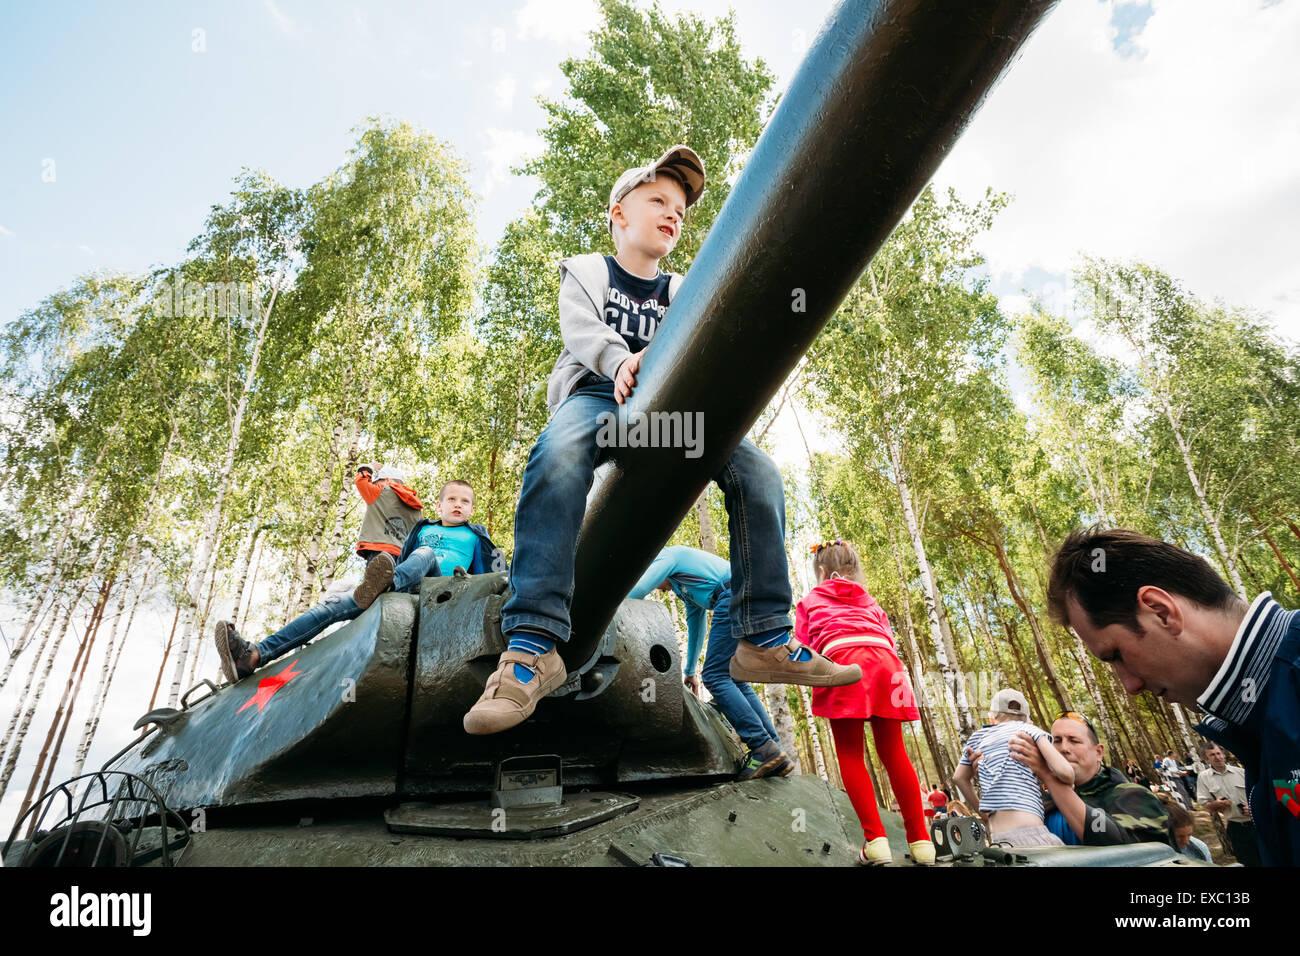 SVIETLAHORSK, BELARUS - JUNE 21, 2014: Children climb on Soviet tank from World War II during celebration events Stock Photo